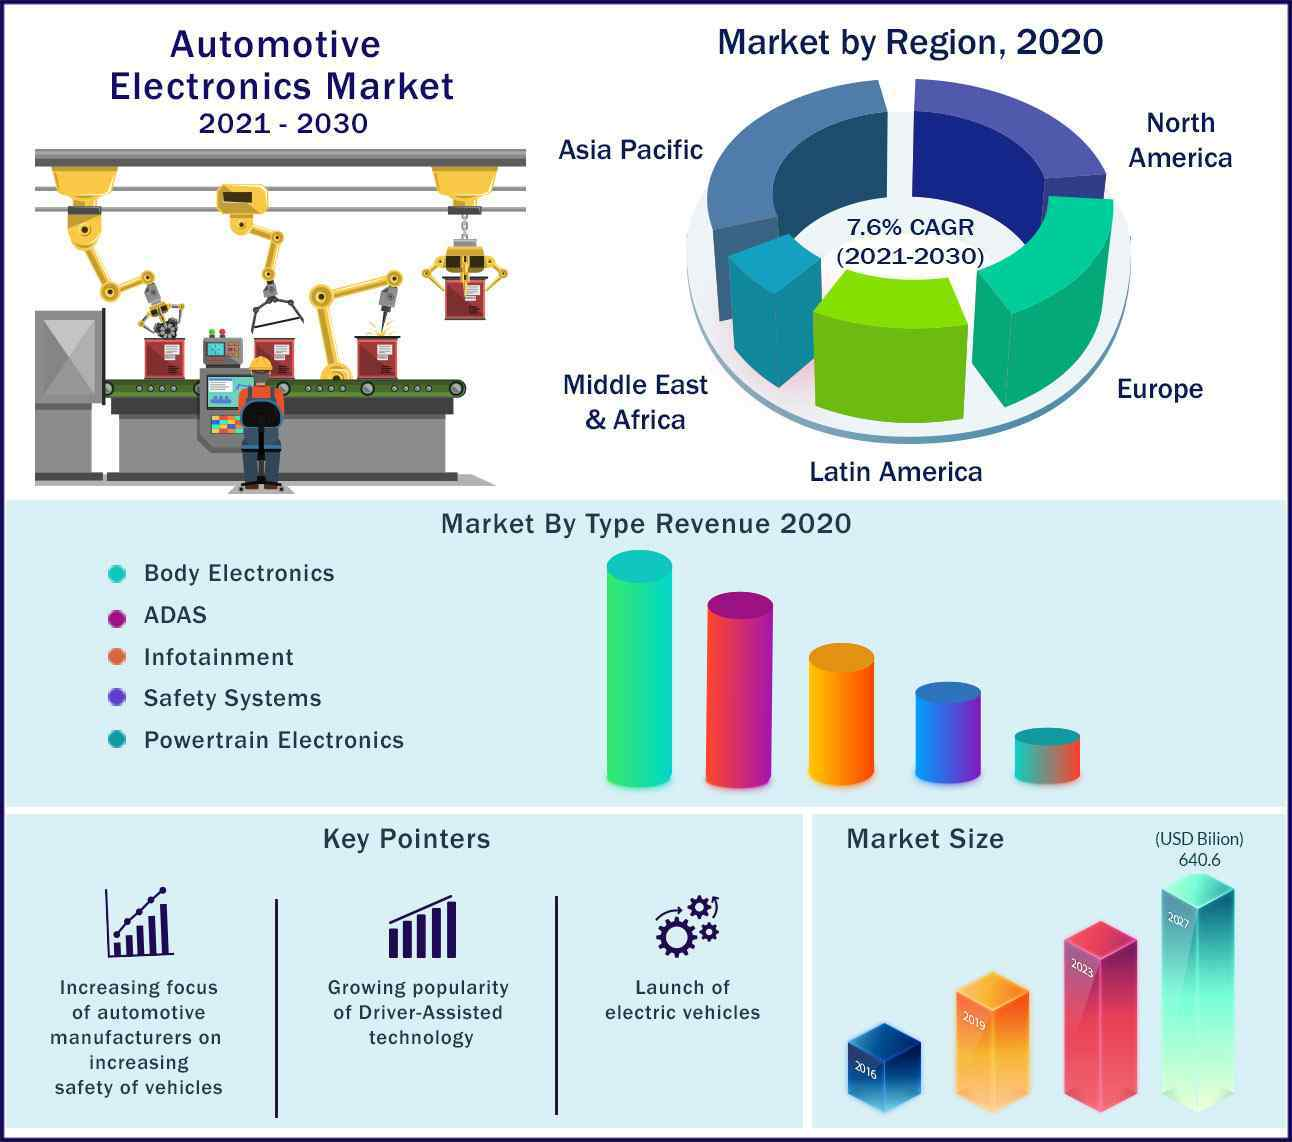 Global Automotive Electronics Market 2021-2030